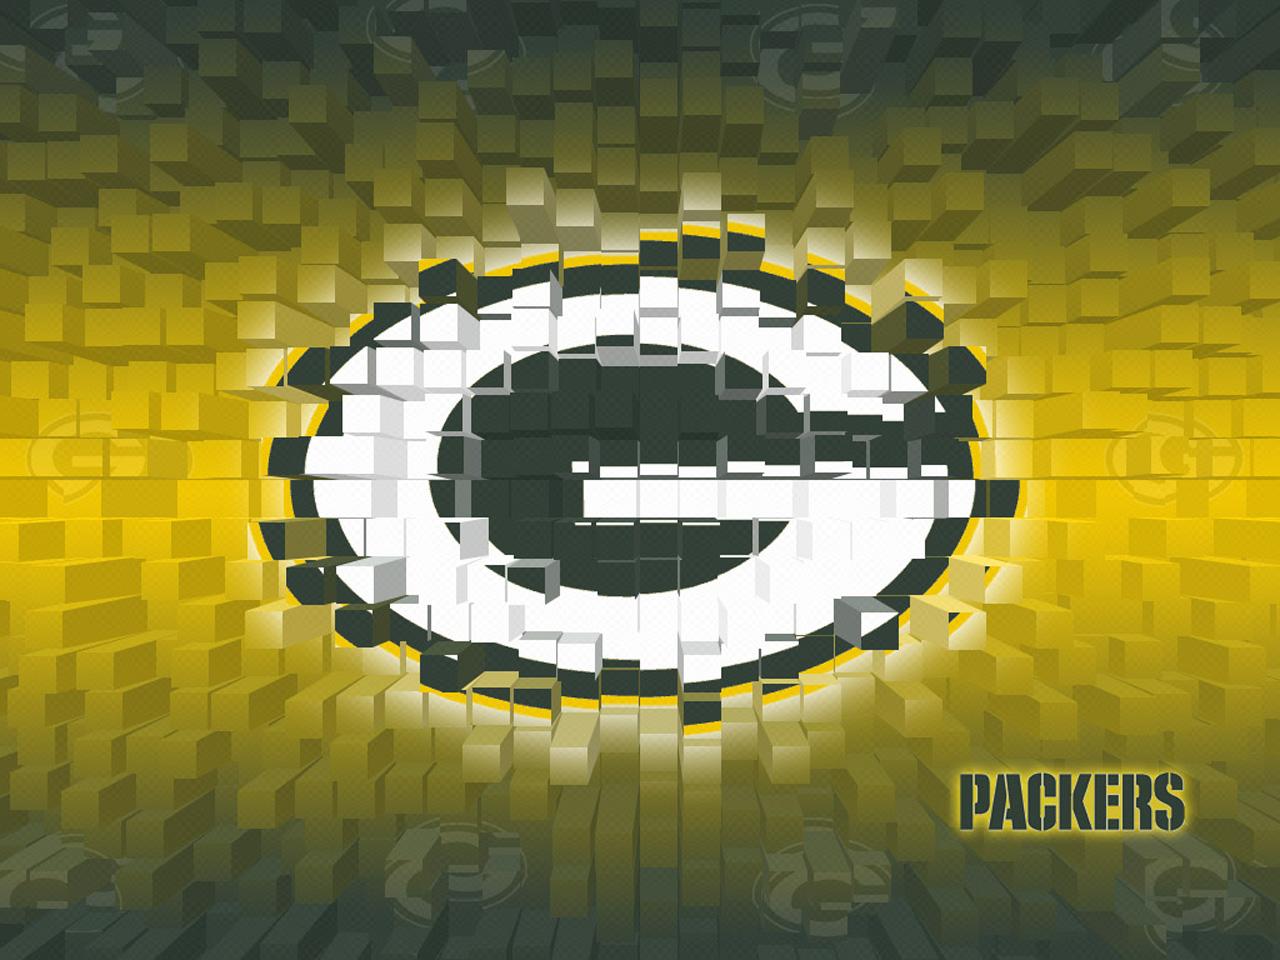 Football Wallpapers: Green Bay Packers Wallpaper